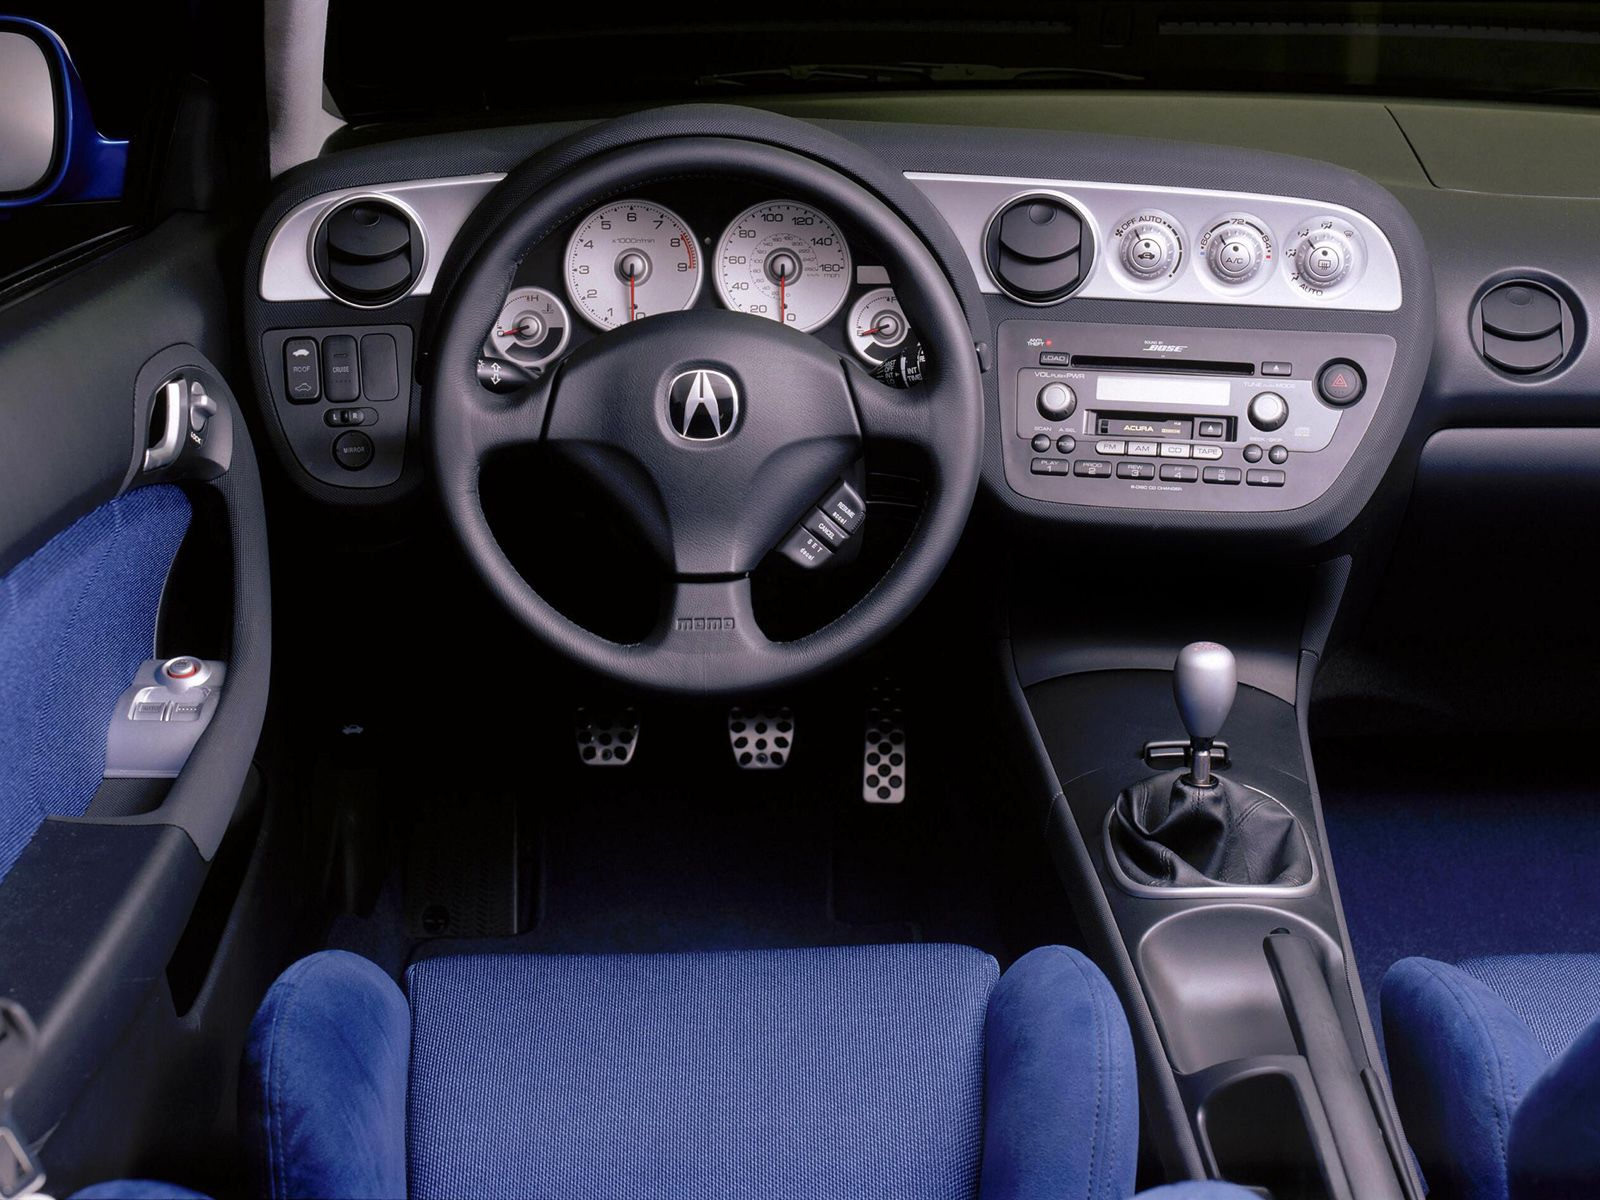 2001 Acura Rsx Prototype Rsx Honda Integra Dc5 Car Interior